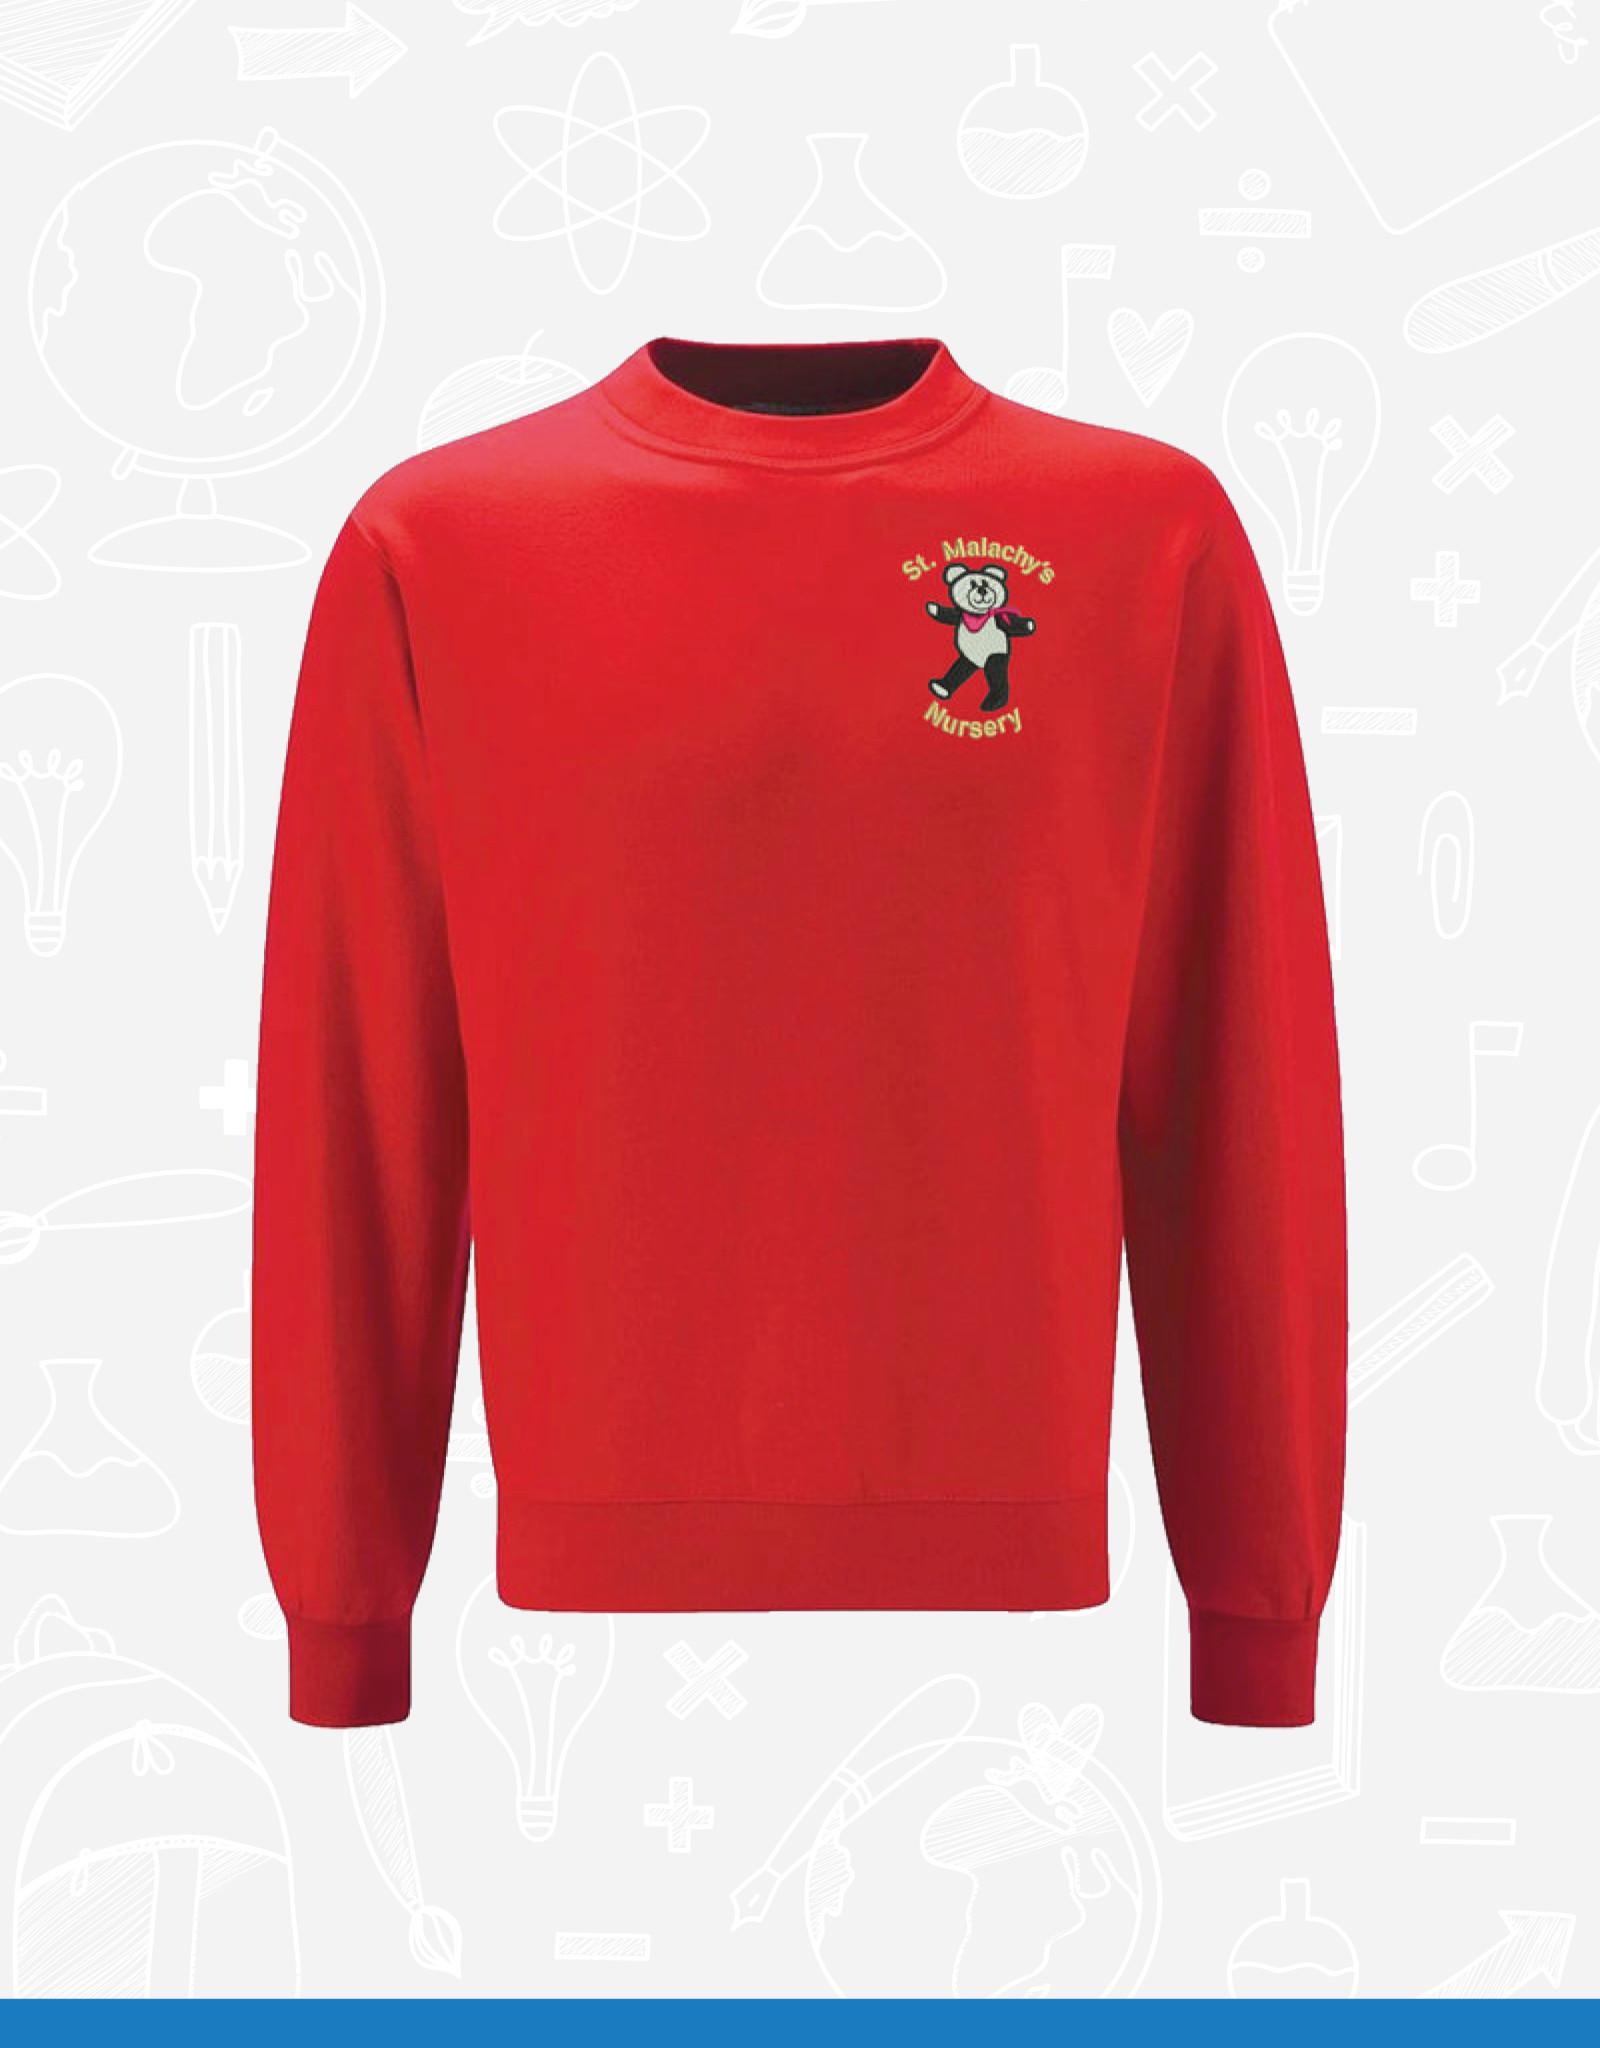 DT St Malachy's Nursery Sweatshirt (DT)